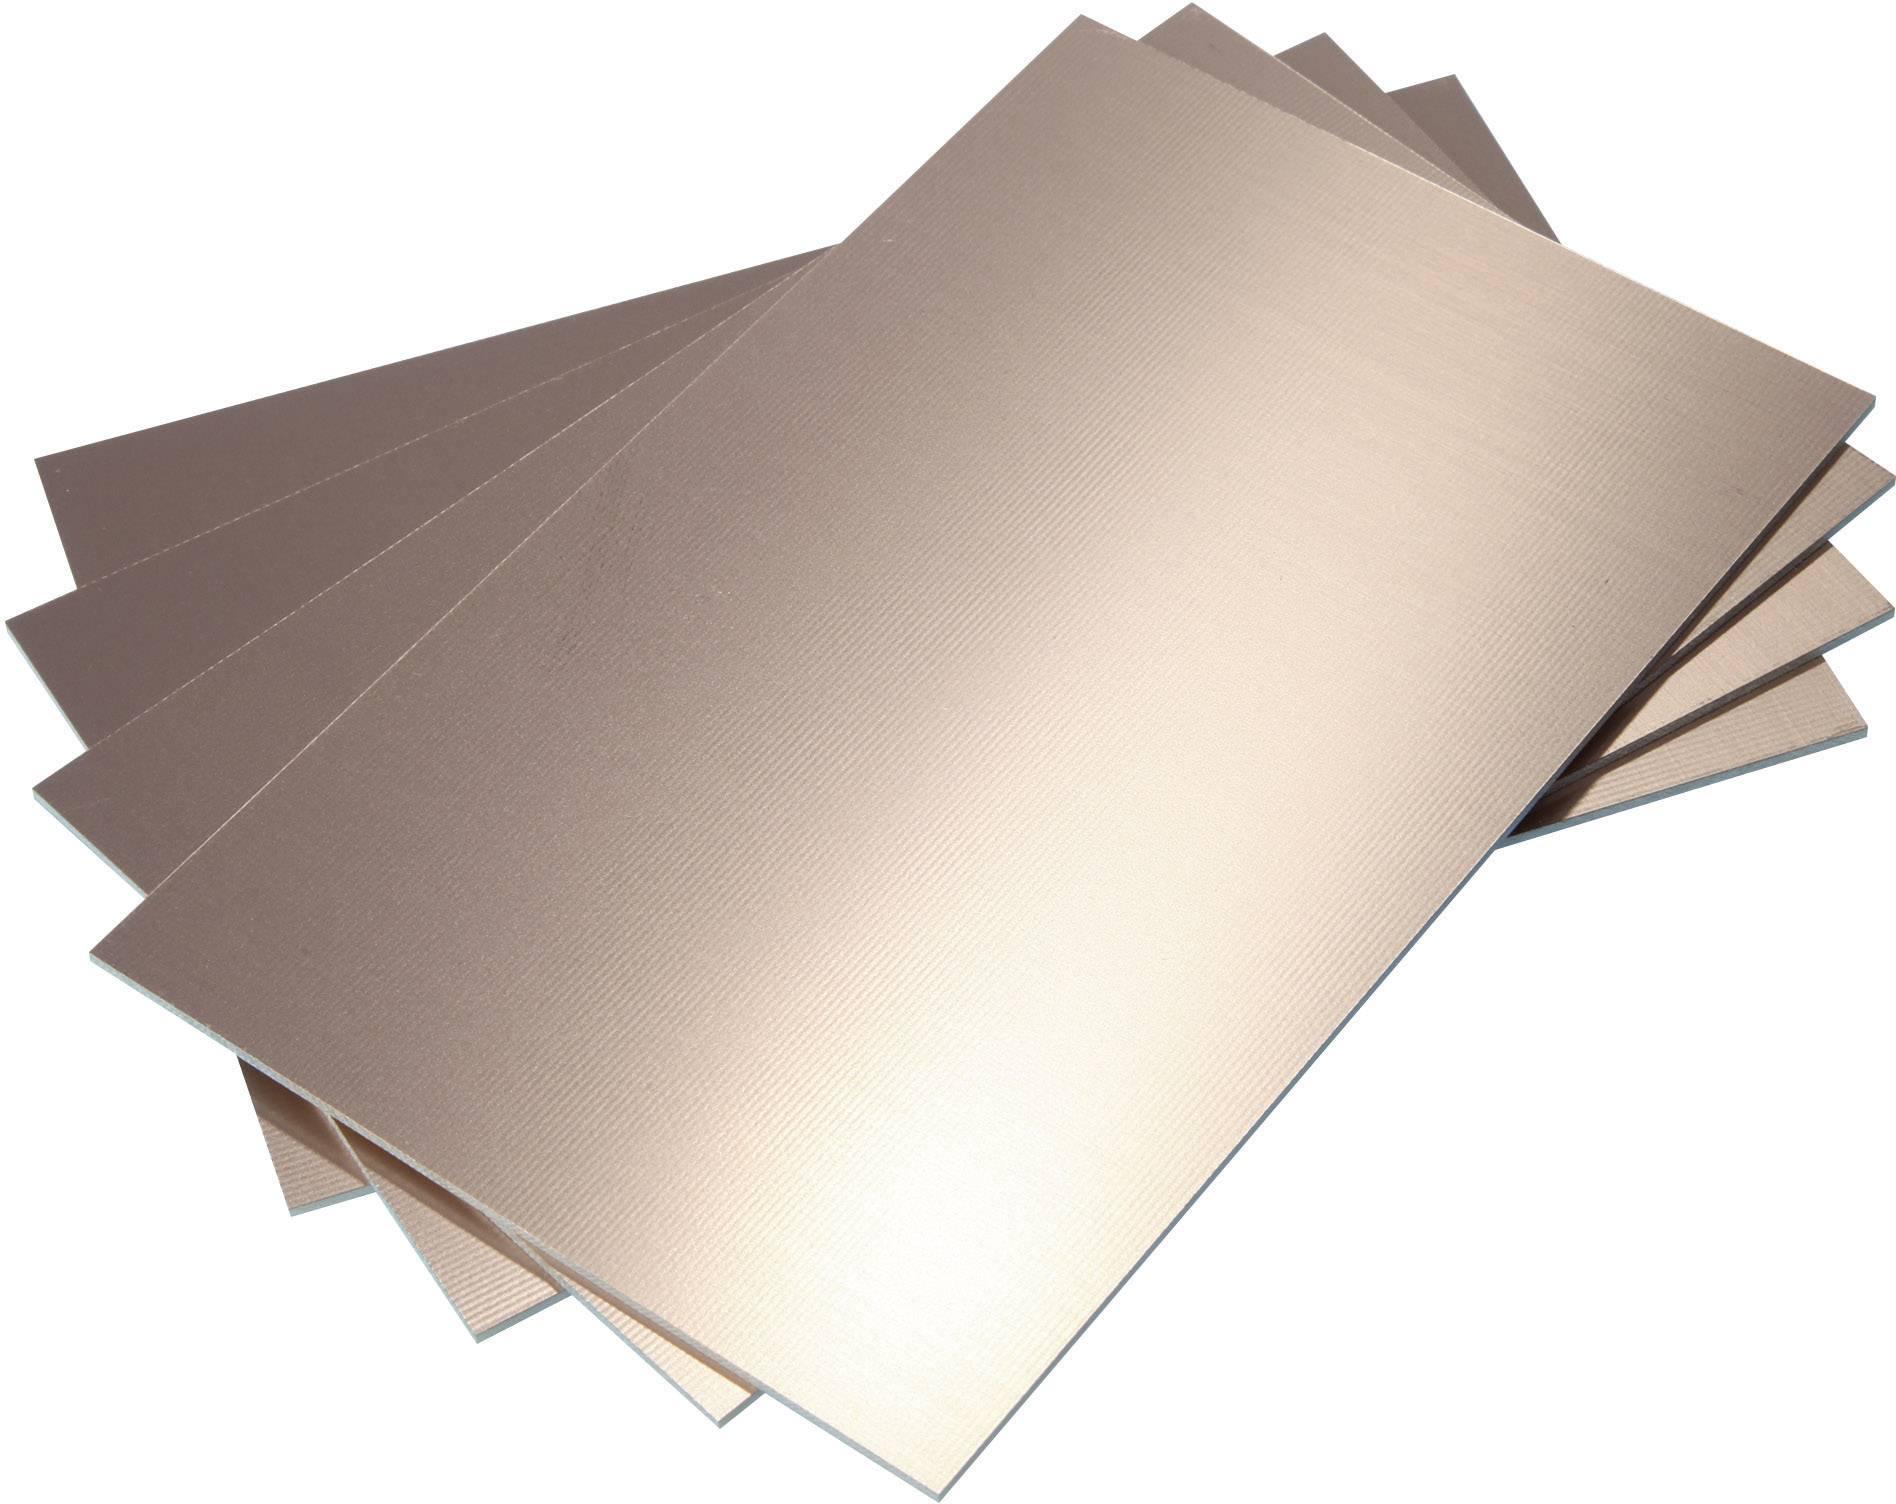 Cuprextit Bungard 030306E52, tvrzený papír, jednostranný, 200 x 200 x 1,5 mm